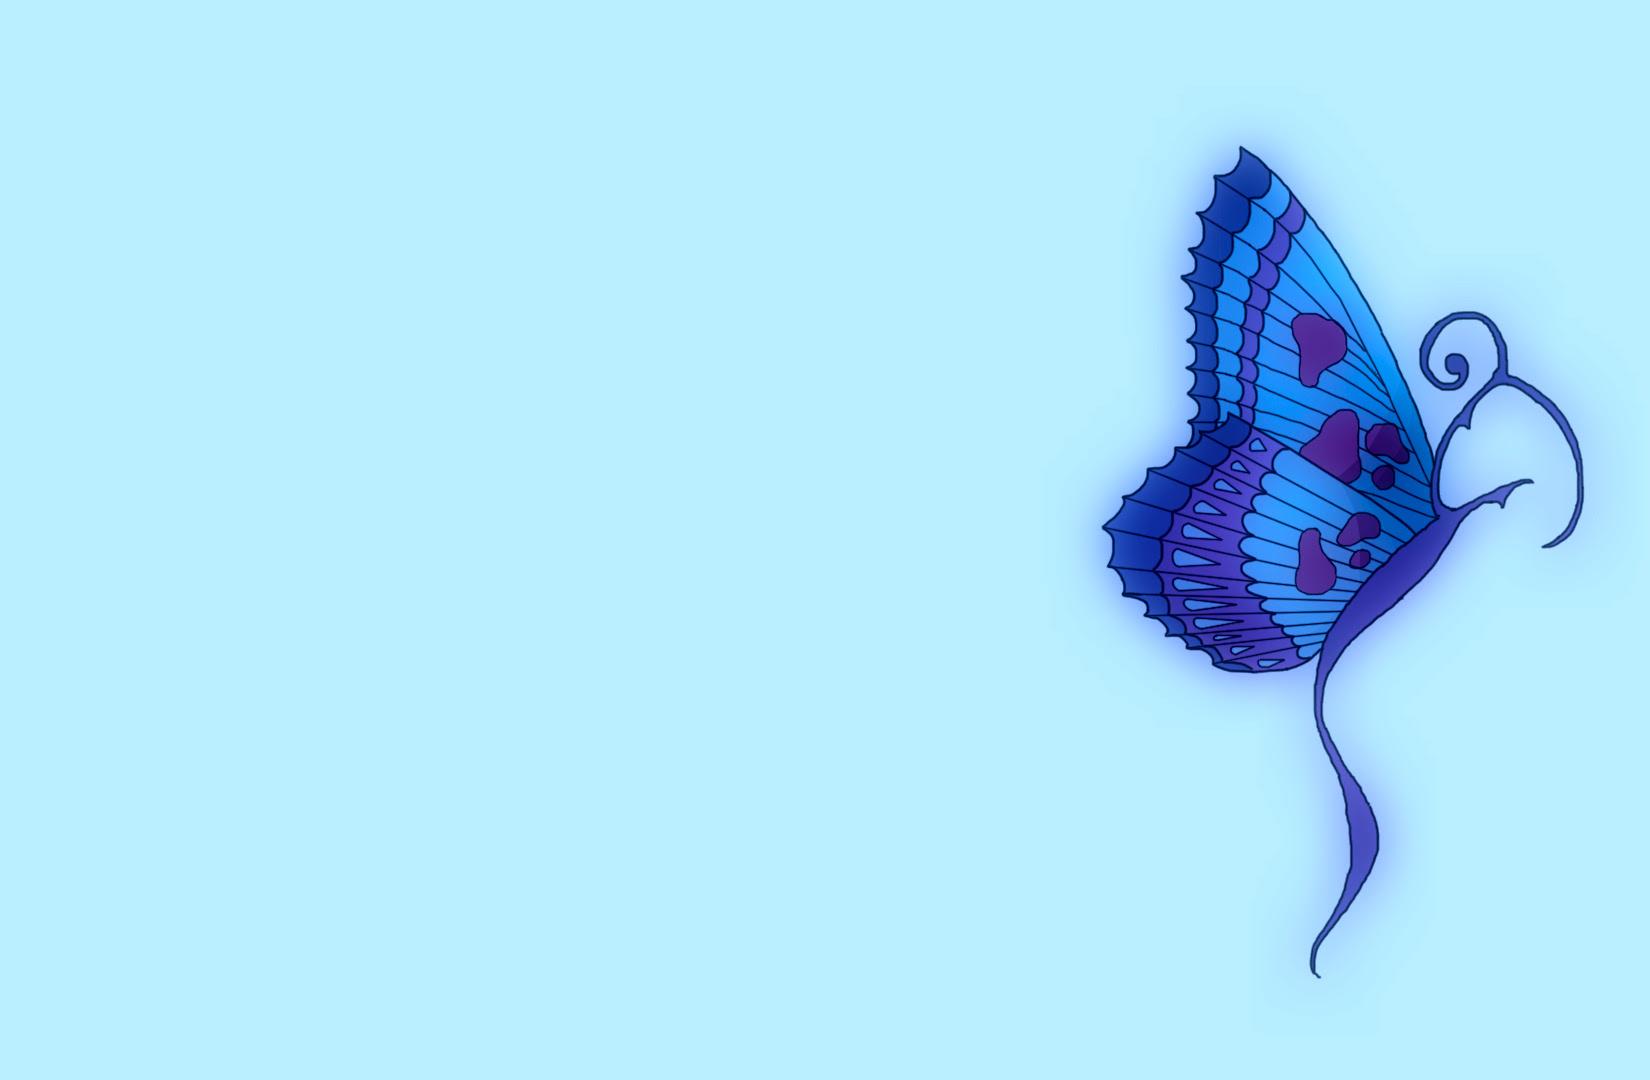 Cute Blue Wallpaper - WallpaperSafari